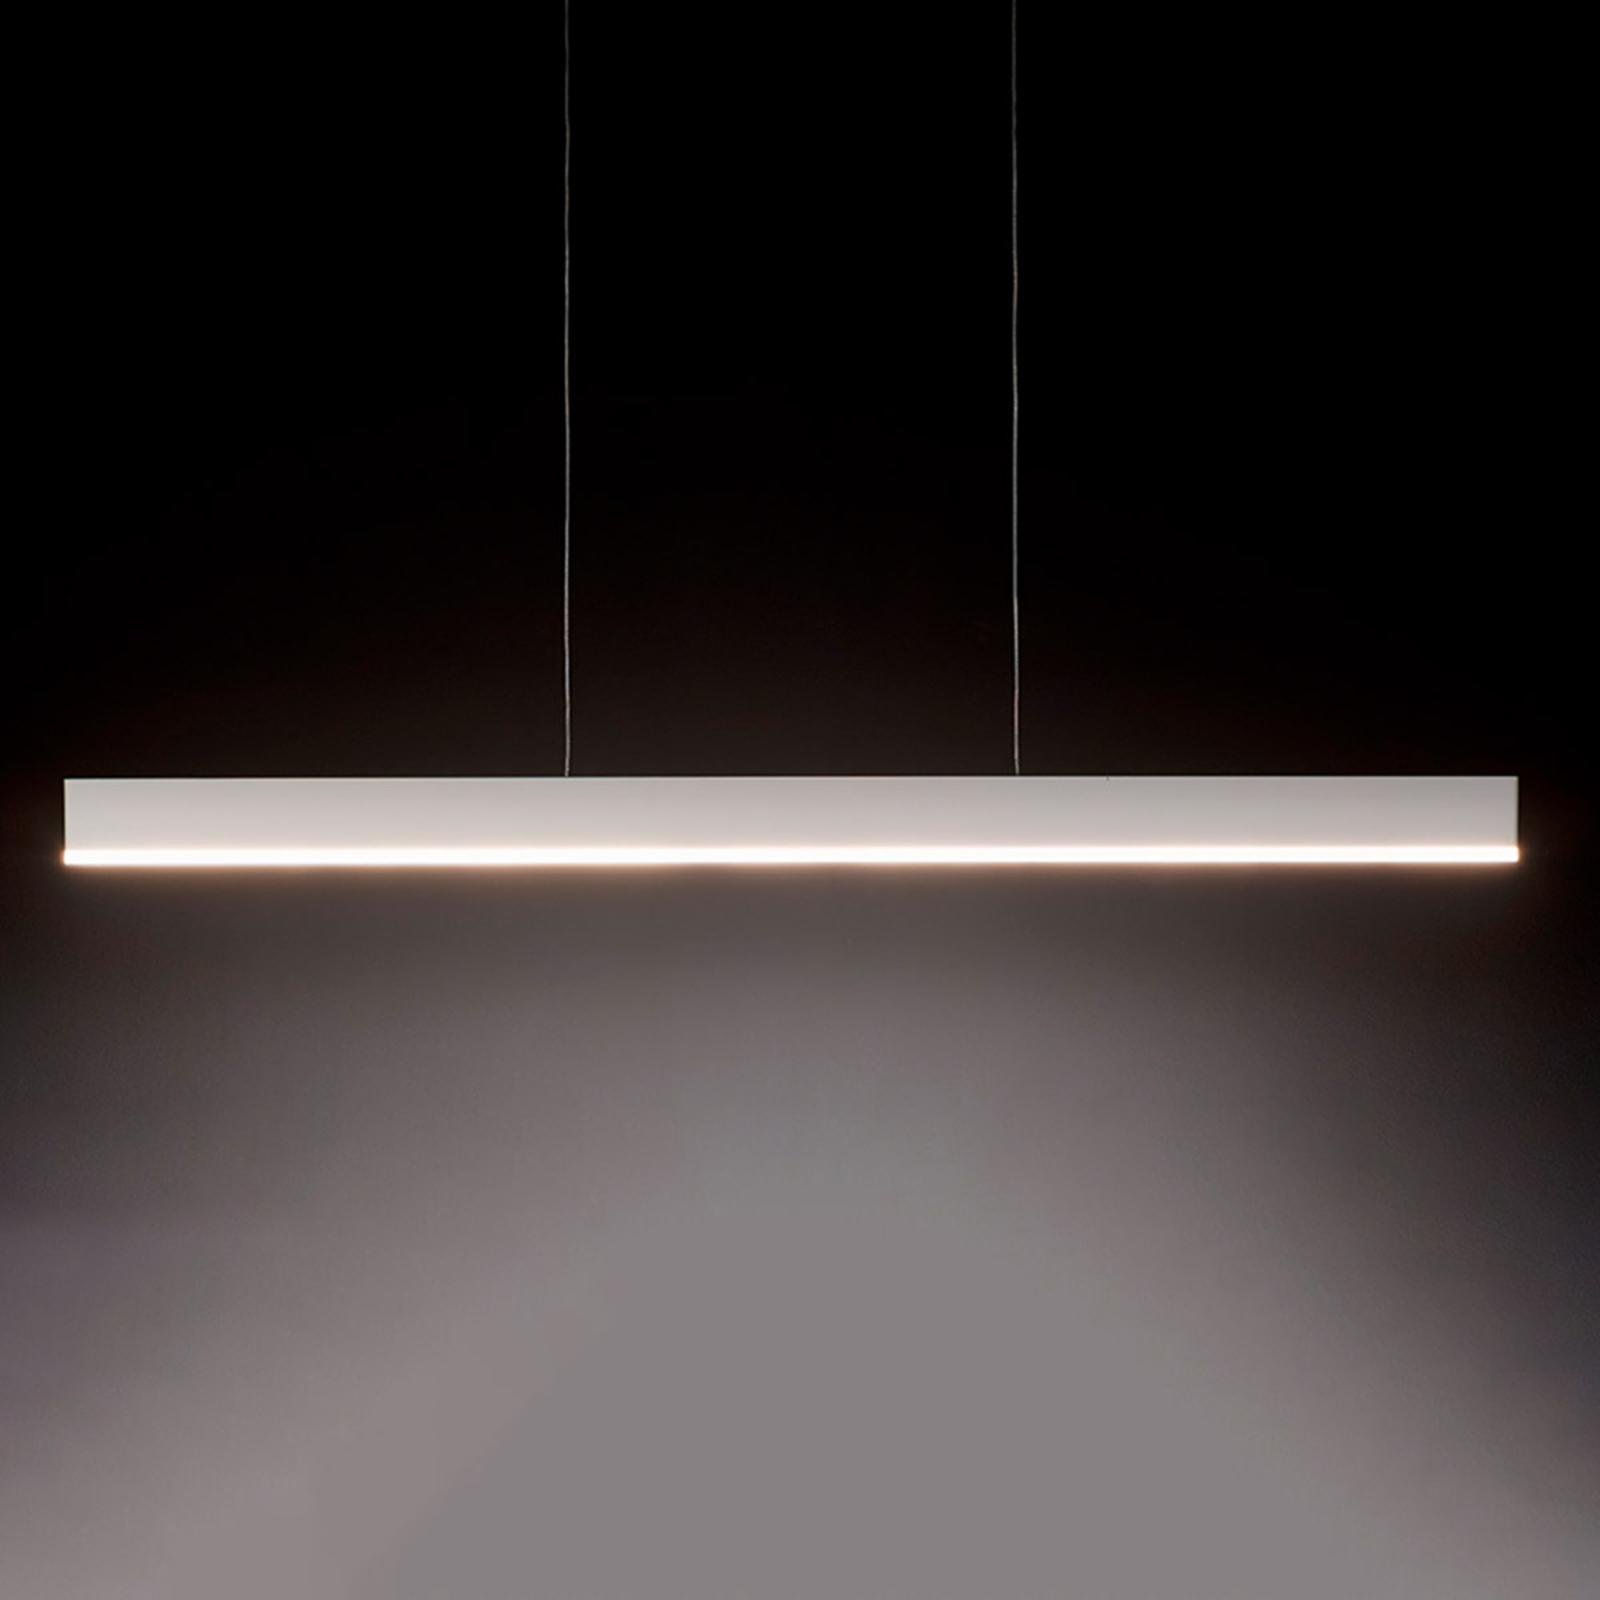 Lampa wisząca LED Riga, 160 cm